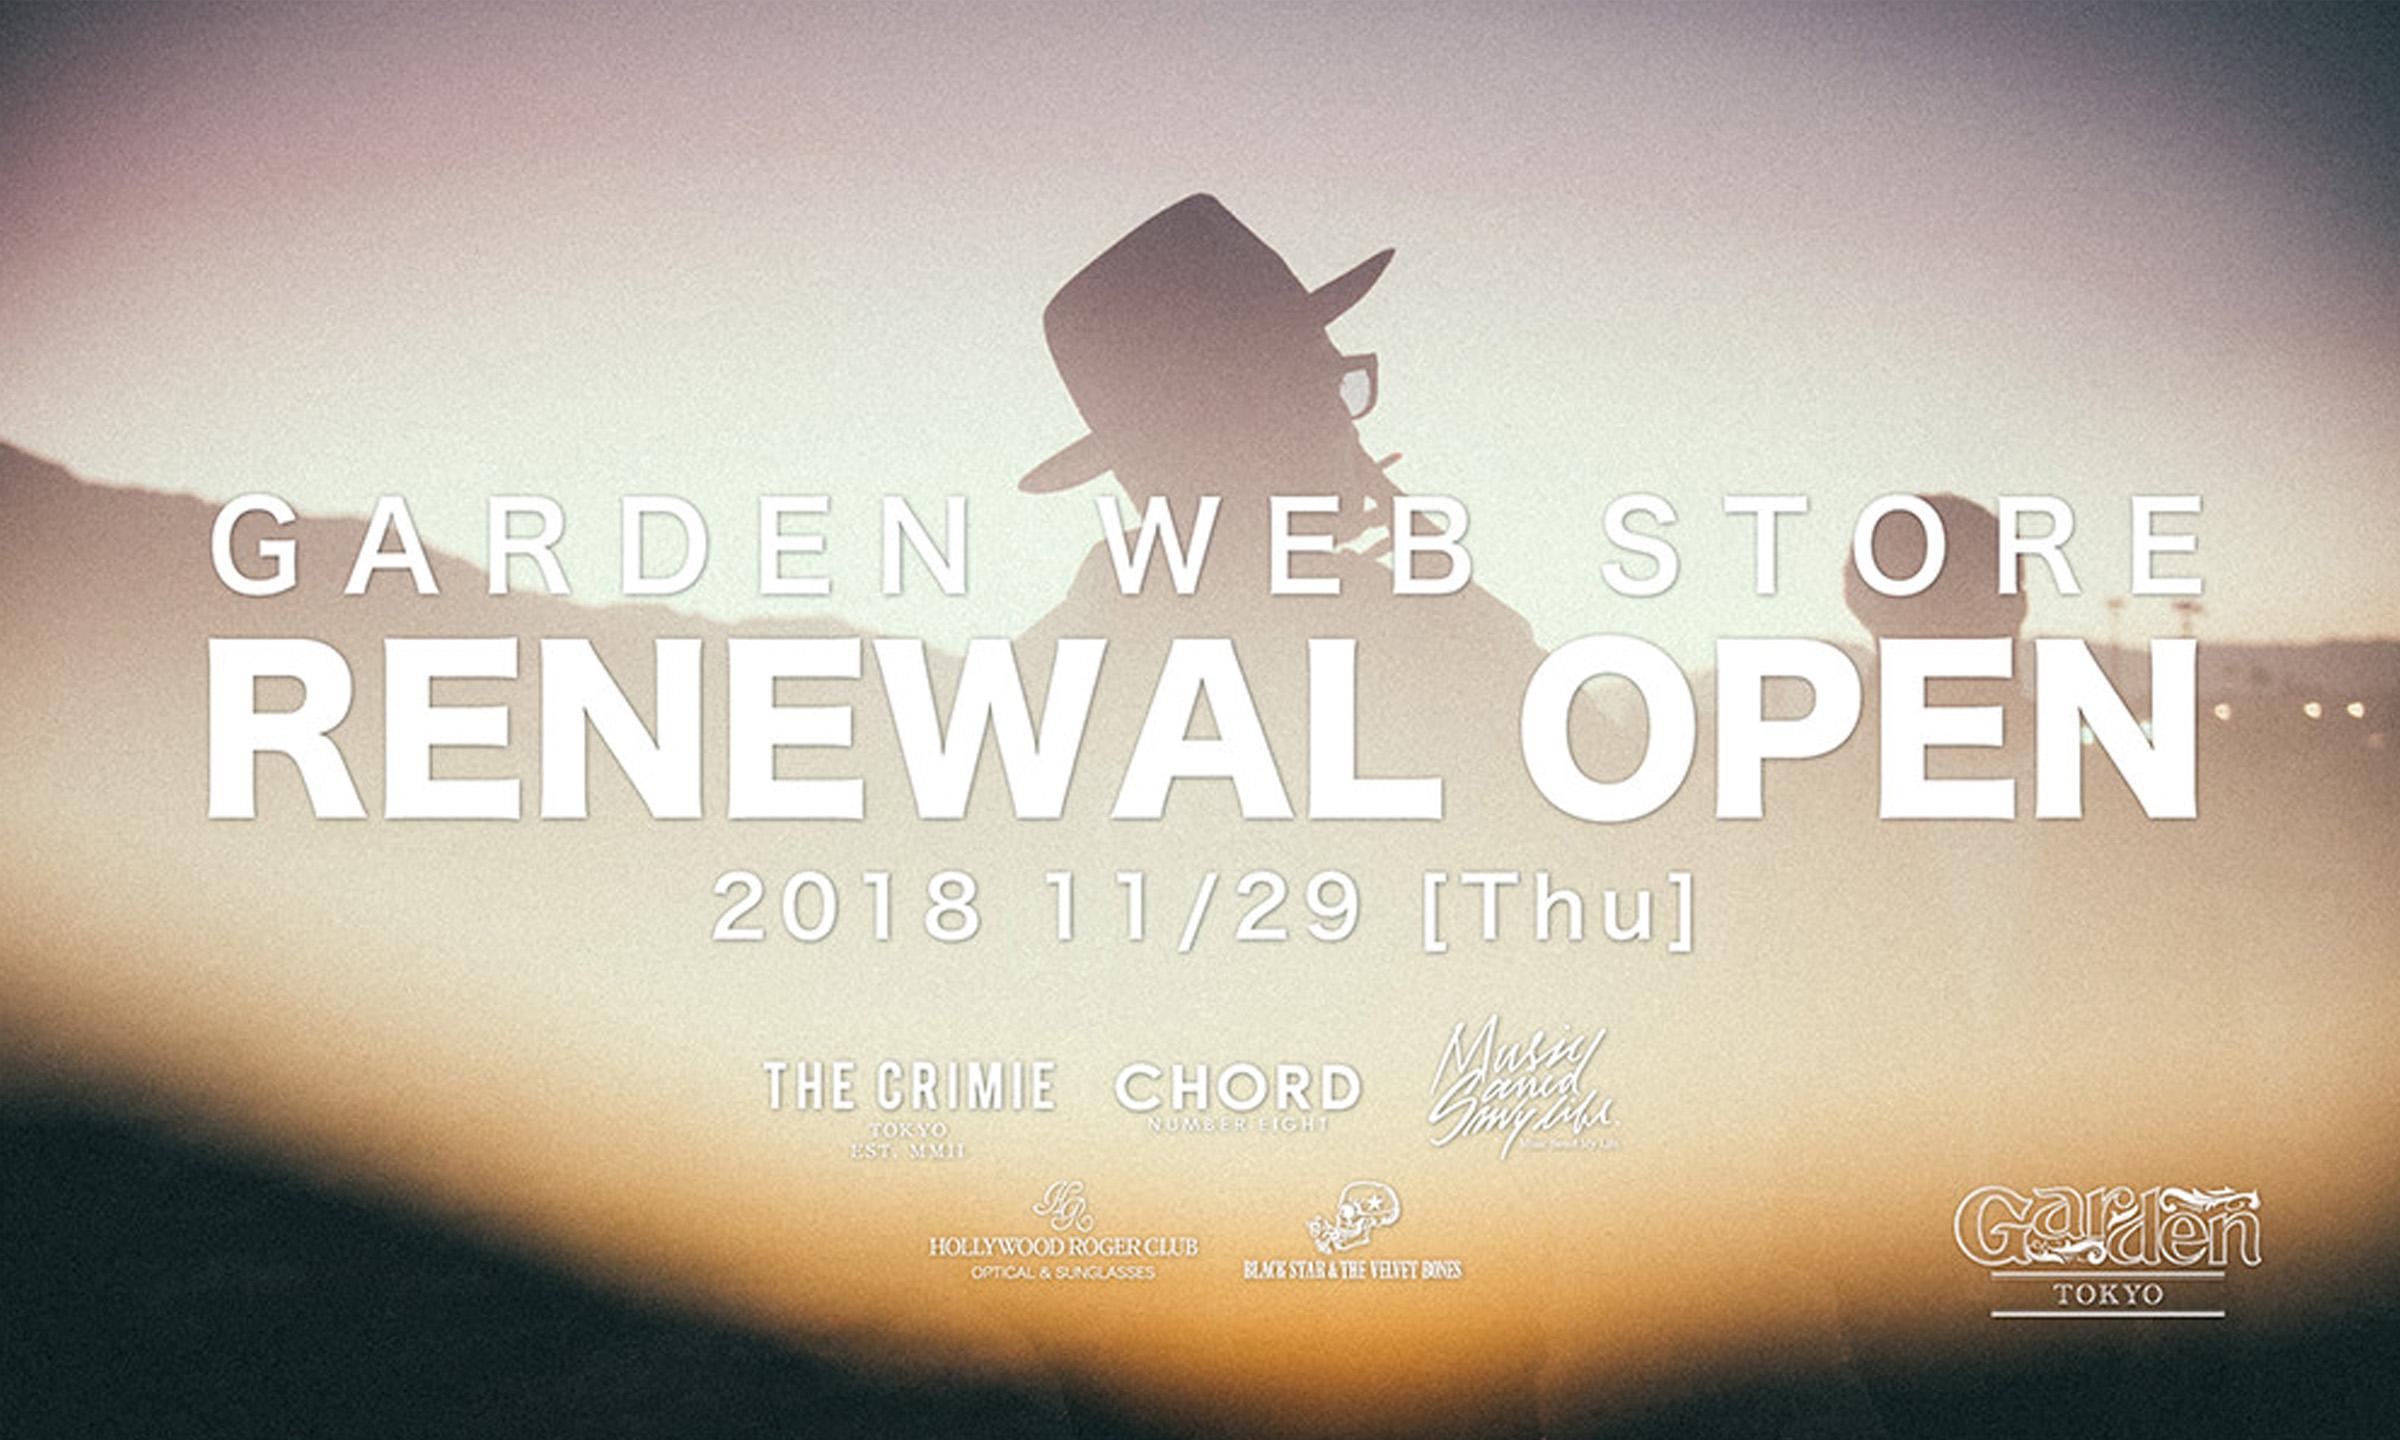 RUDOブランドを扱うセレクトショップ GARDEN WEB STORE -RENEWAL OPEN 11.29-